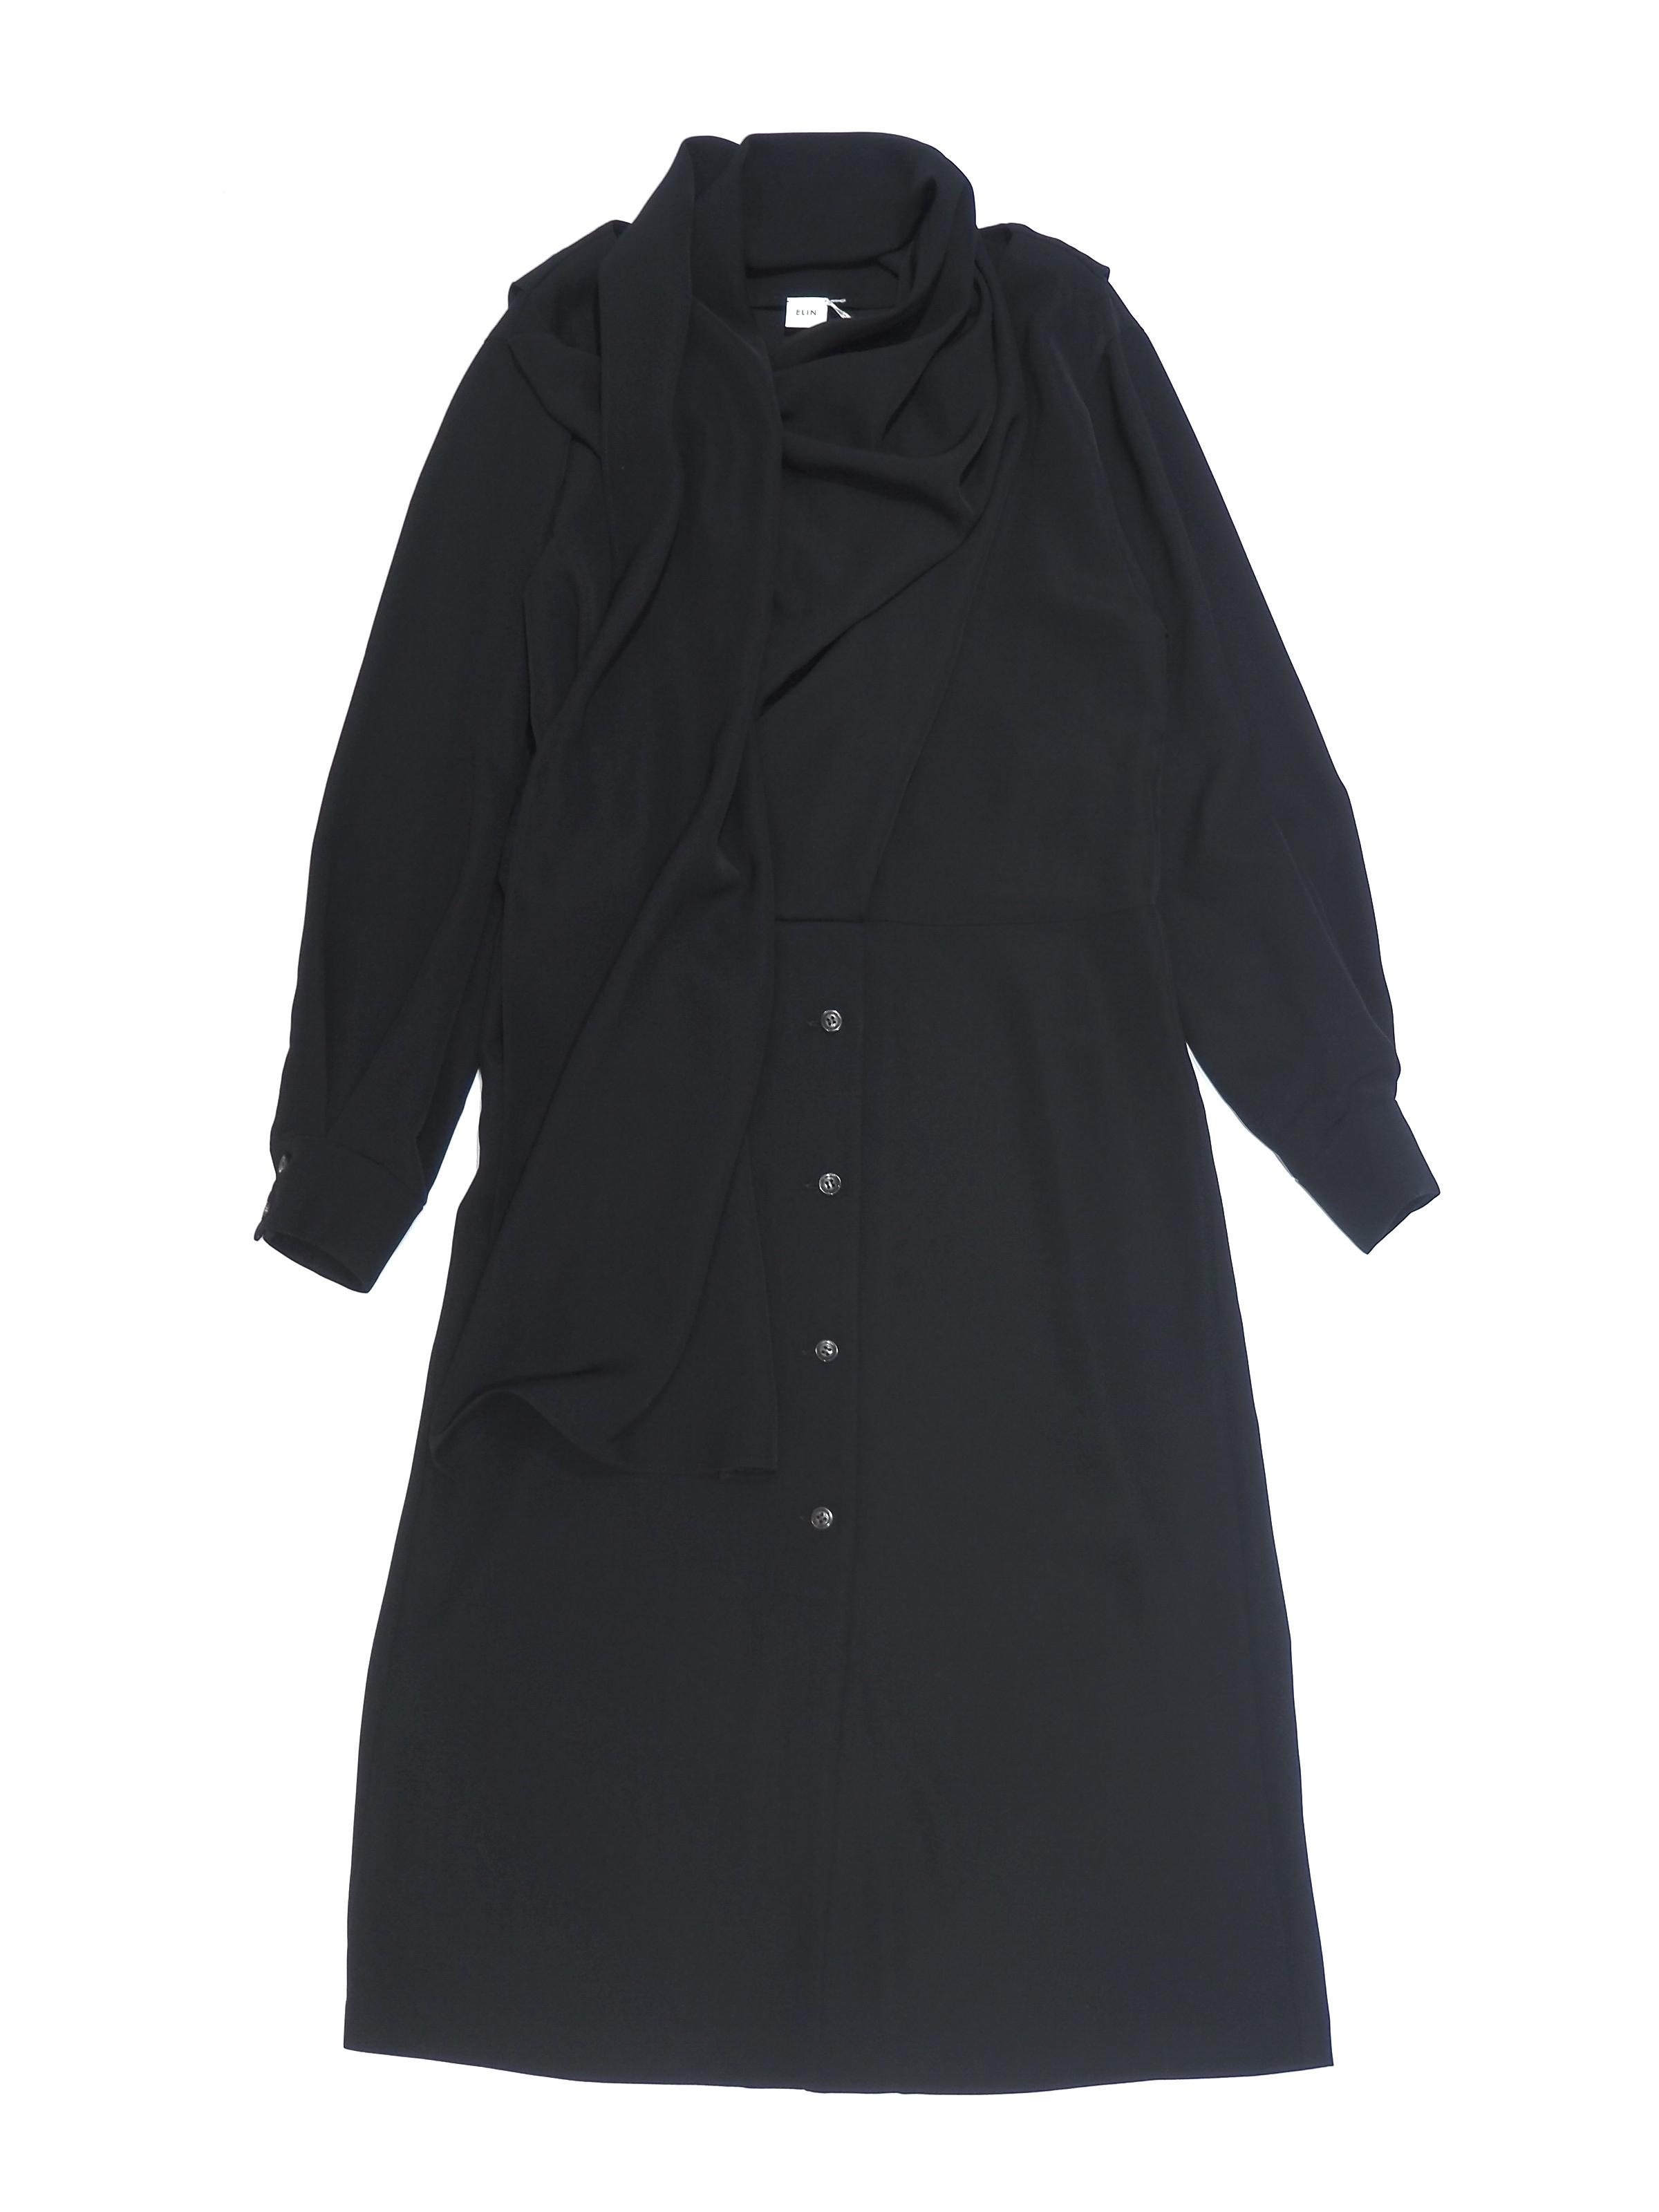 【ELIN】TWILL STOLE DRESS